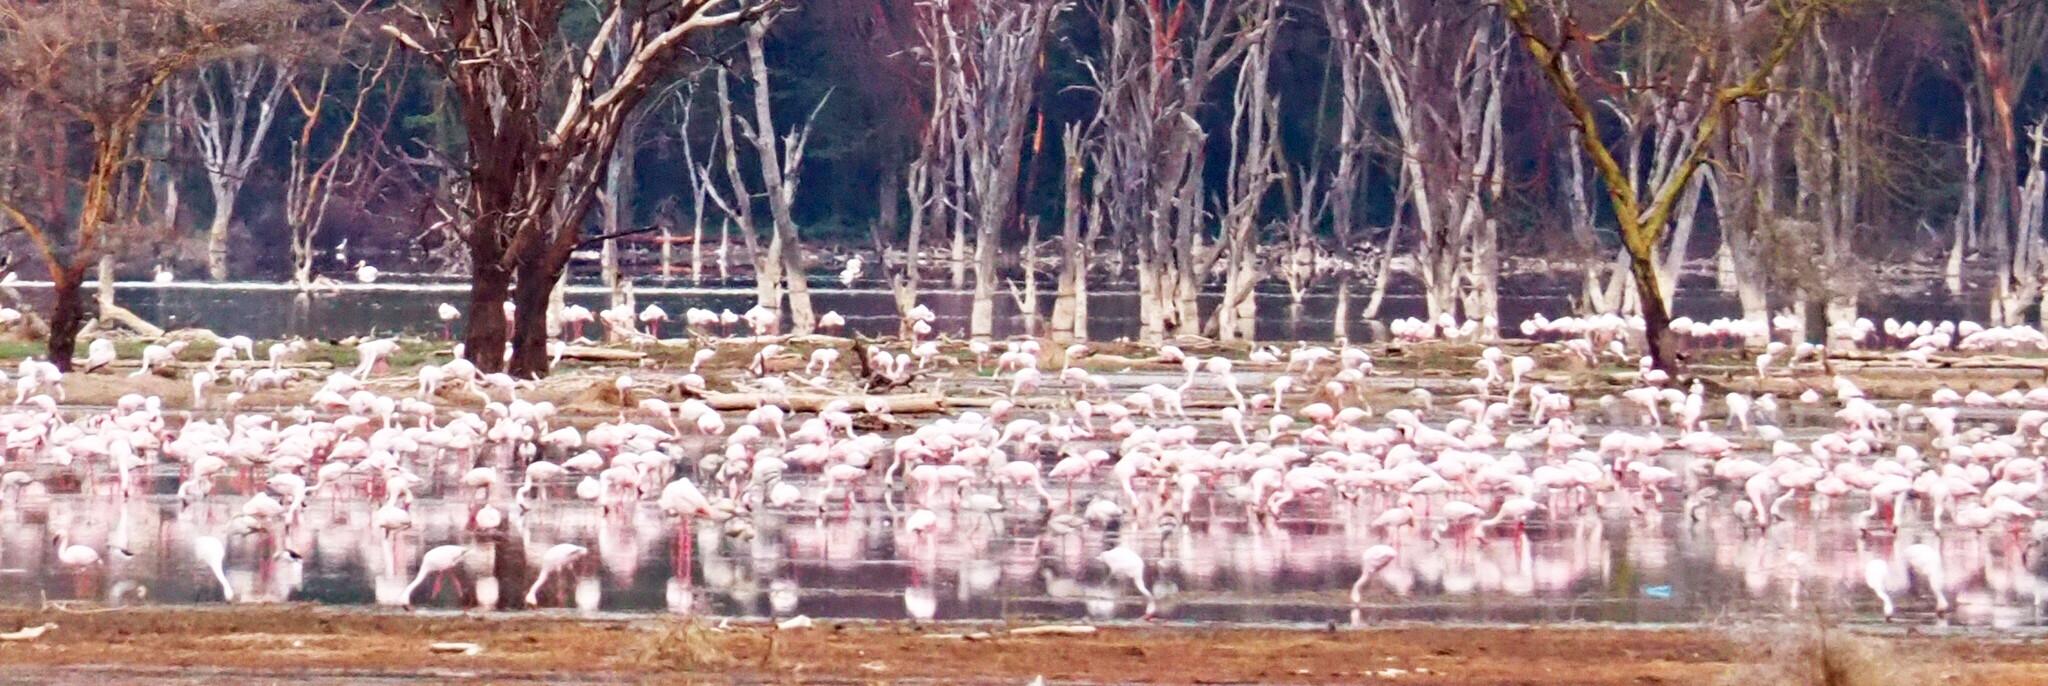 Reisebericht Kenia - Flamingos am Lake Nakuru